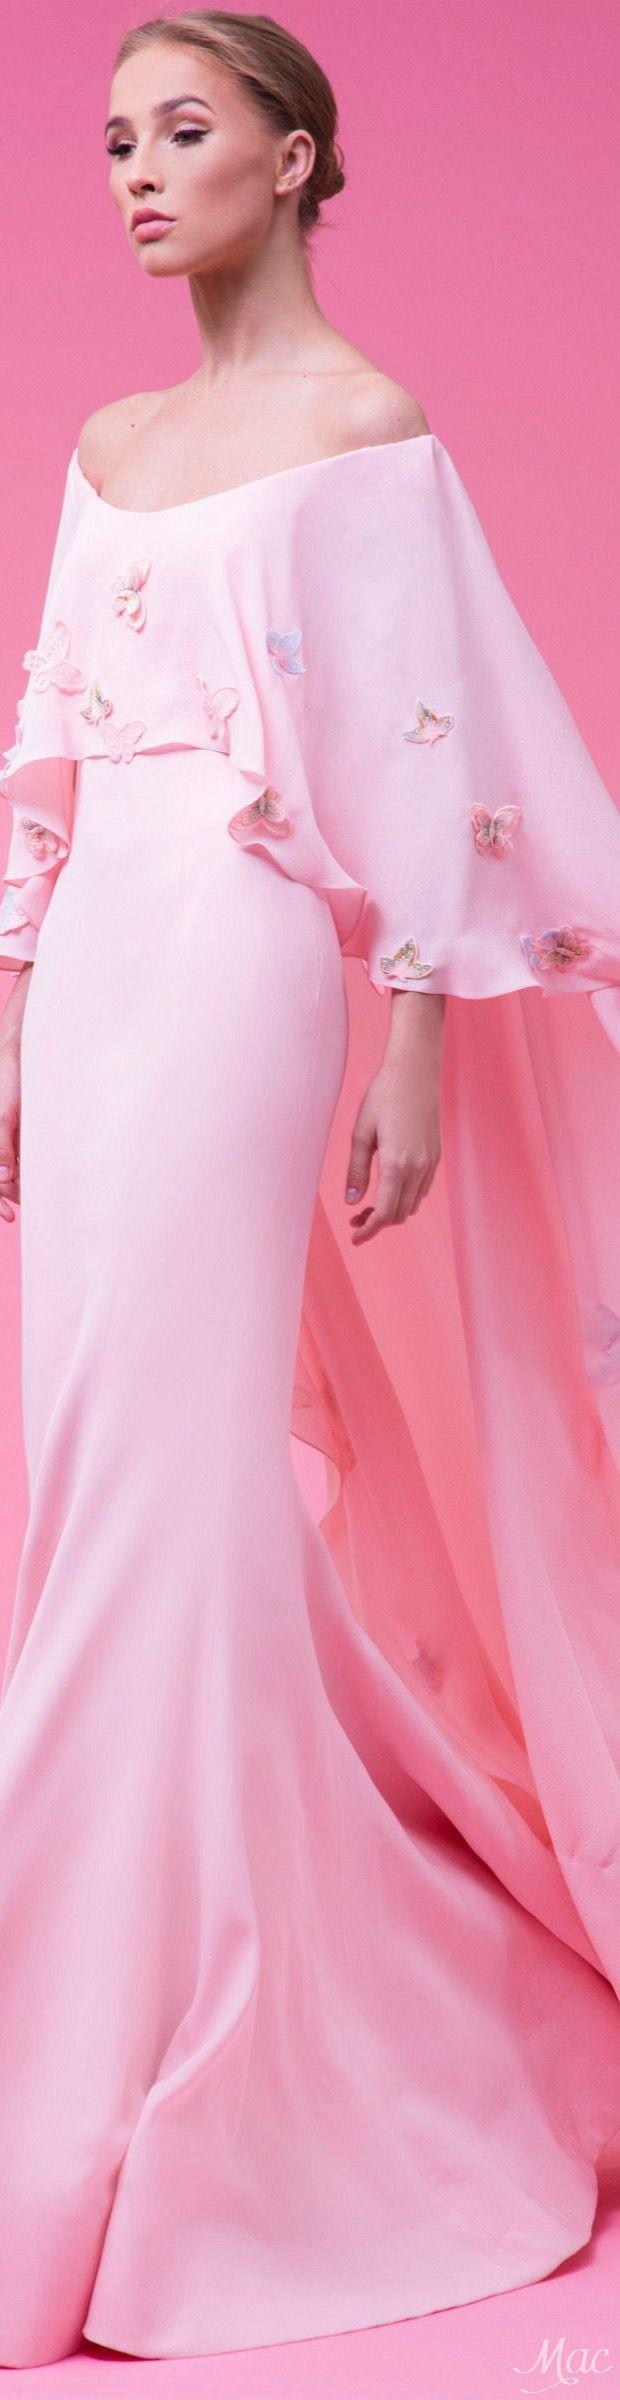 Spring 2017 Ready-to-Wear Rani Zakhem